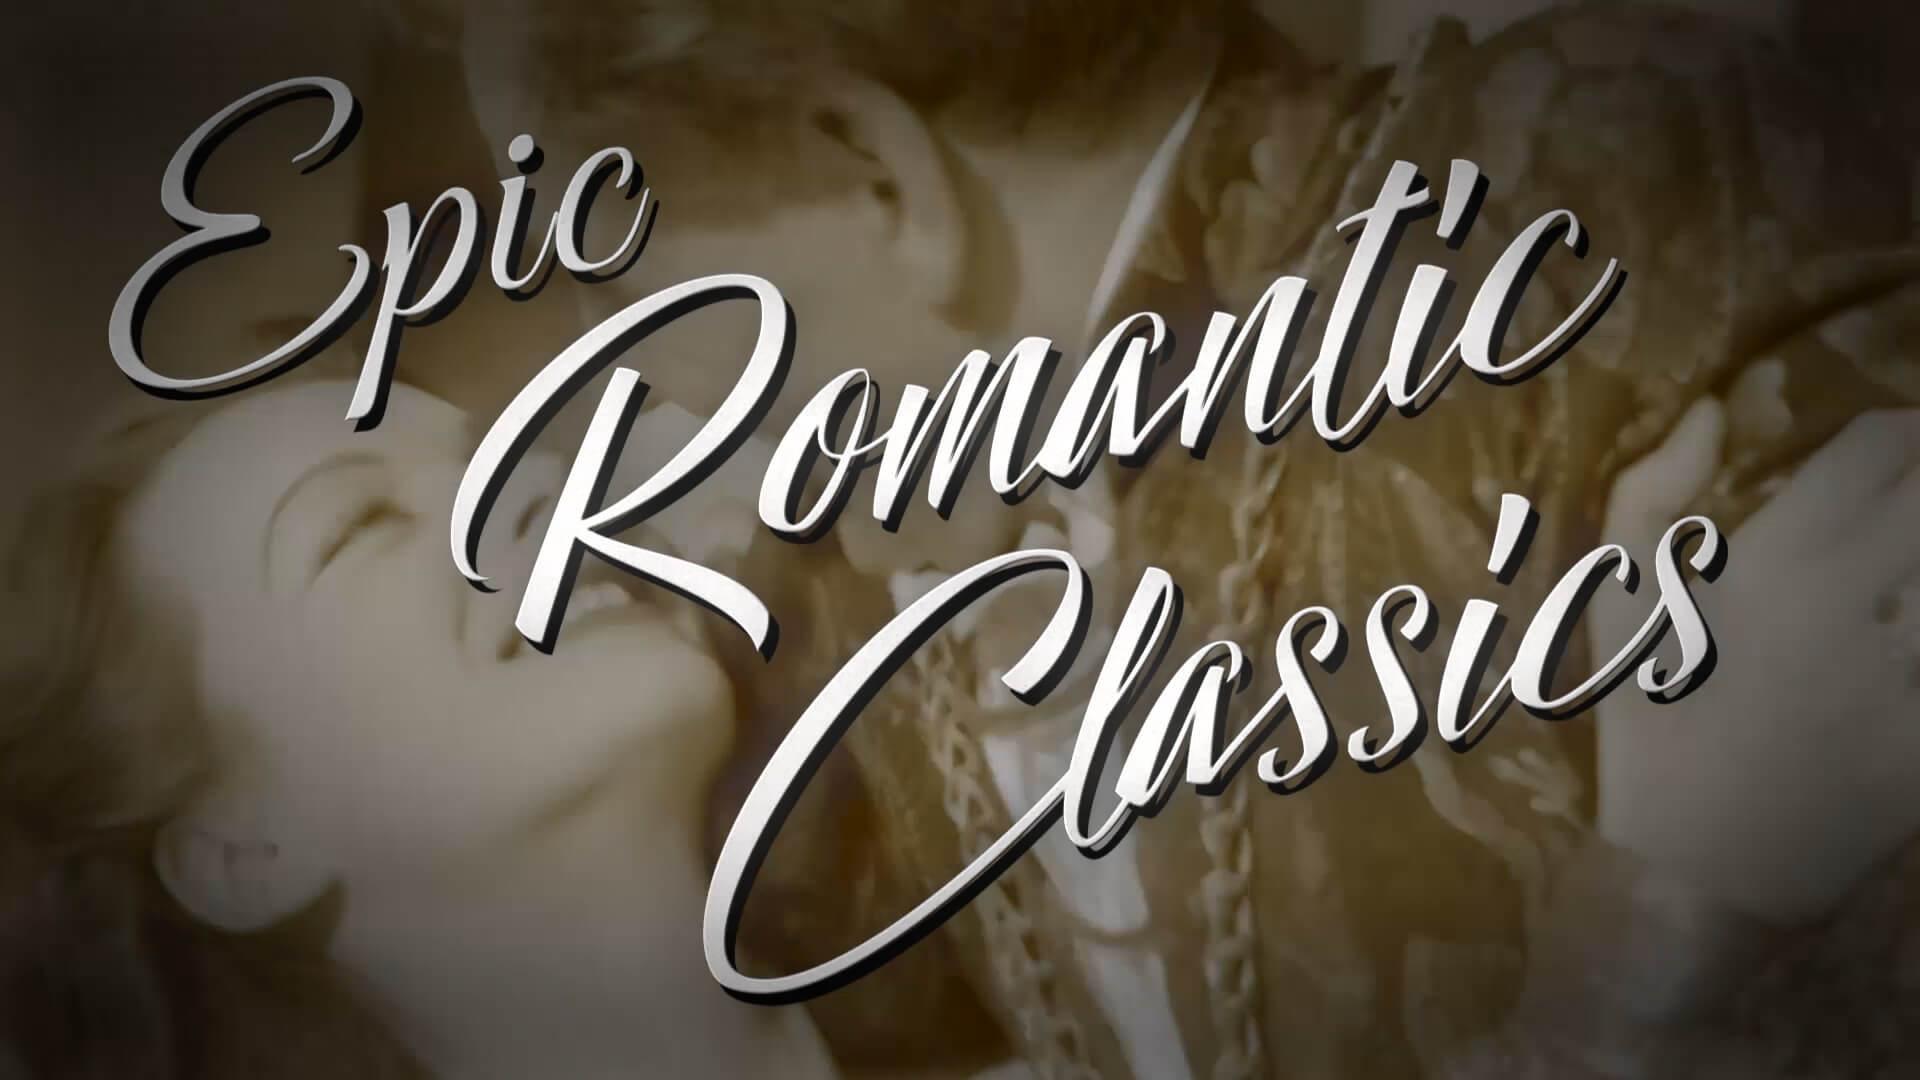 Vintage Classic Romance Movie Title